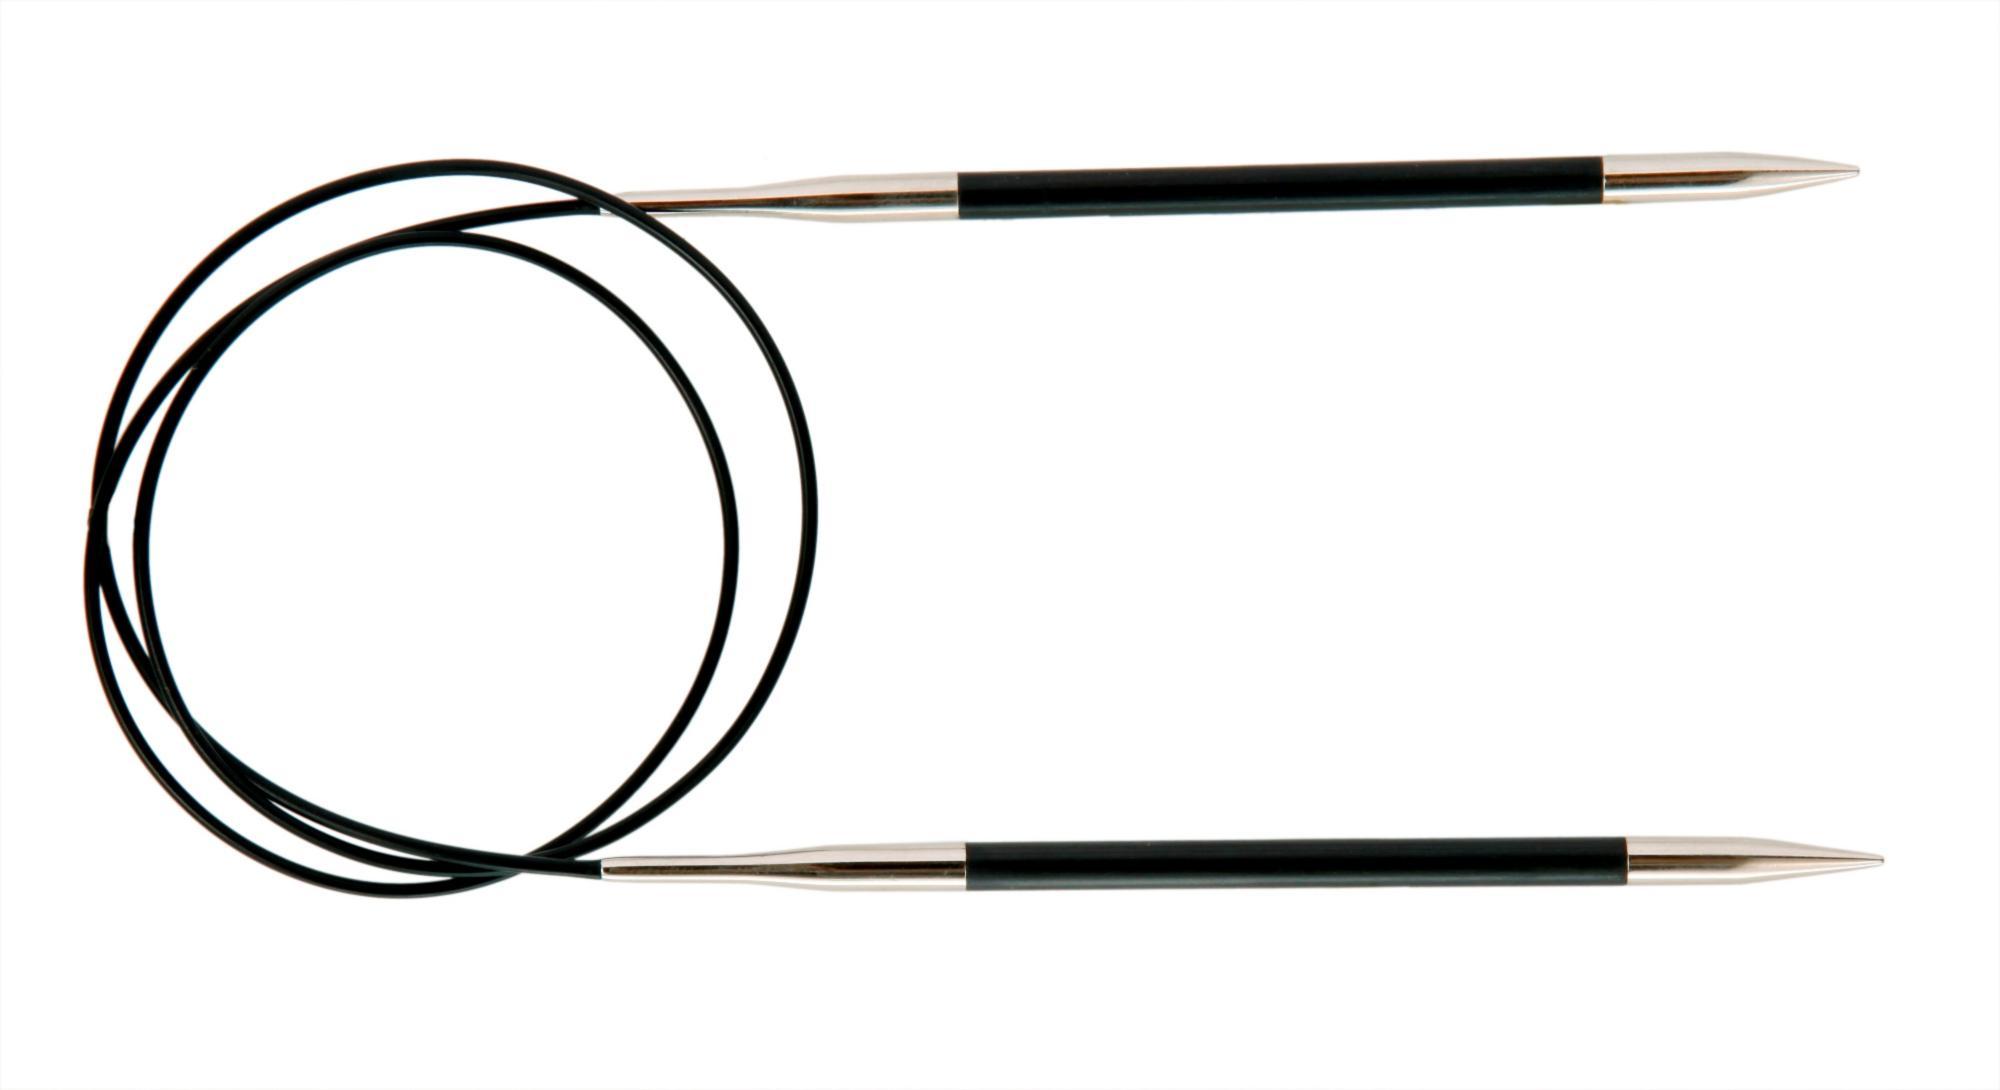 Спицы круговые 60 см Karbonz KnitPro, 41170, 5.00 мм